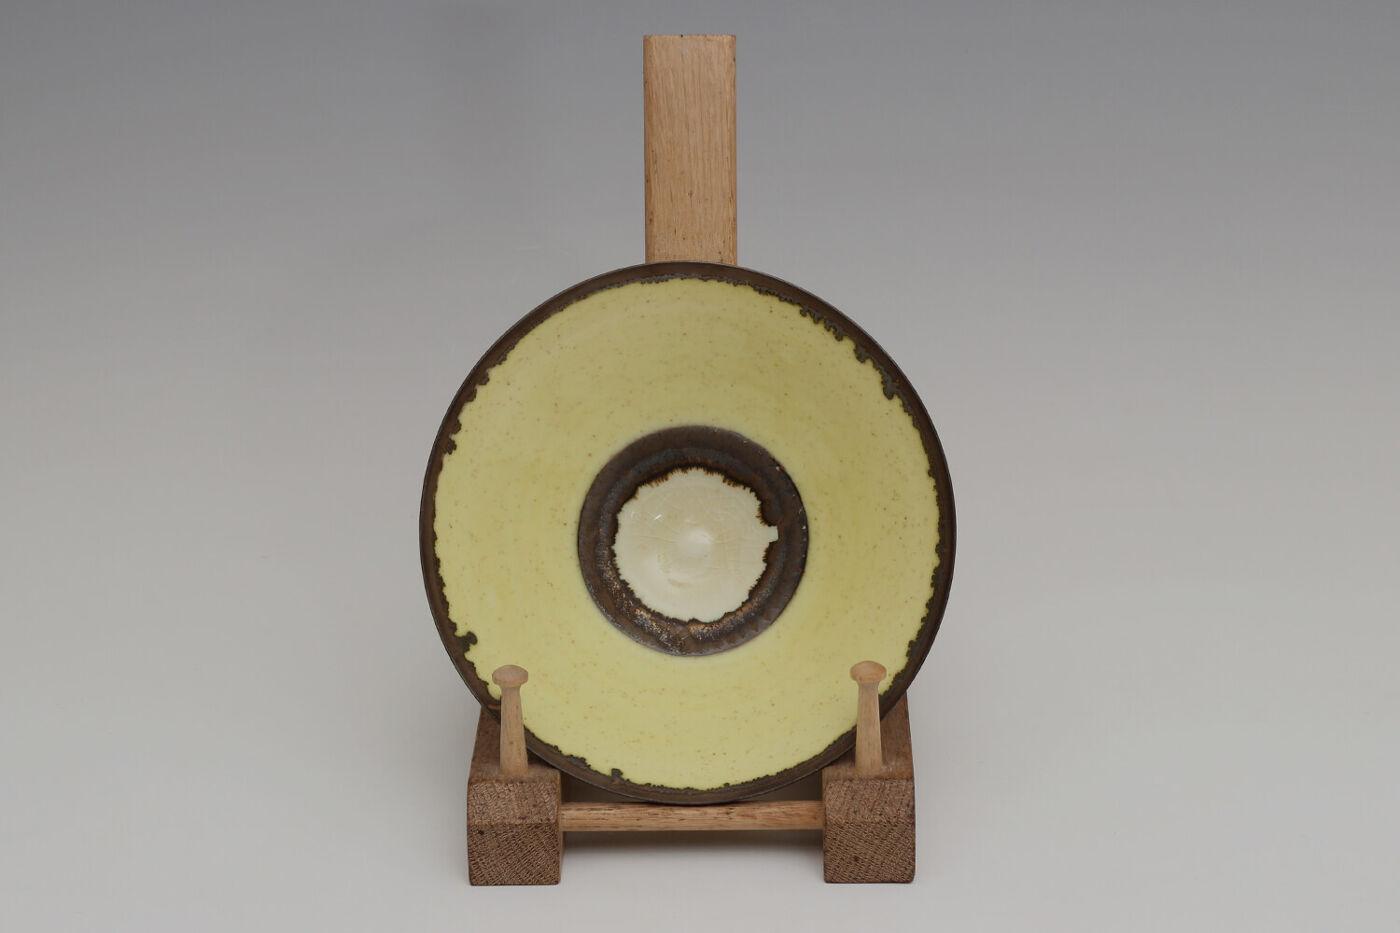 Peter Wills Ceramic Pale Flecked Yellow Porcelain Bowl 203